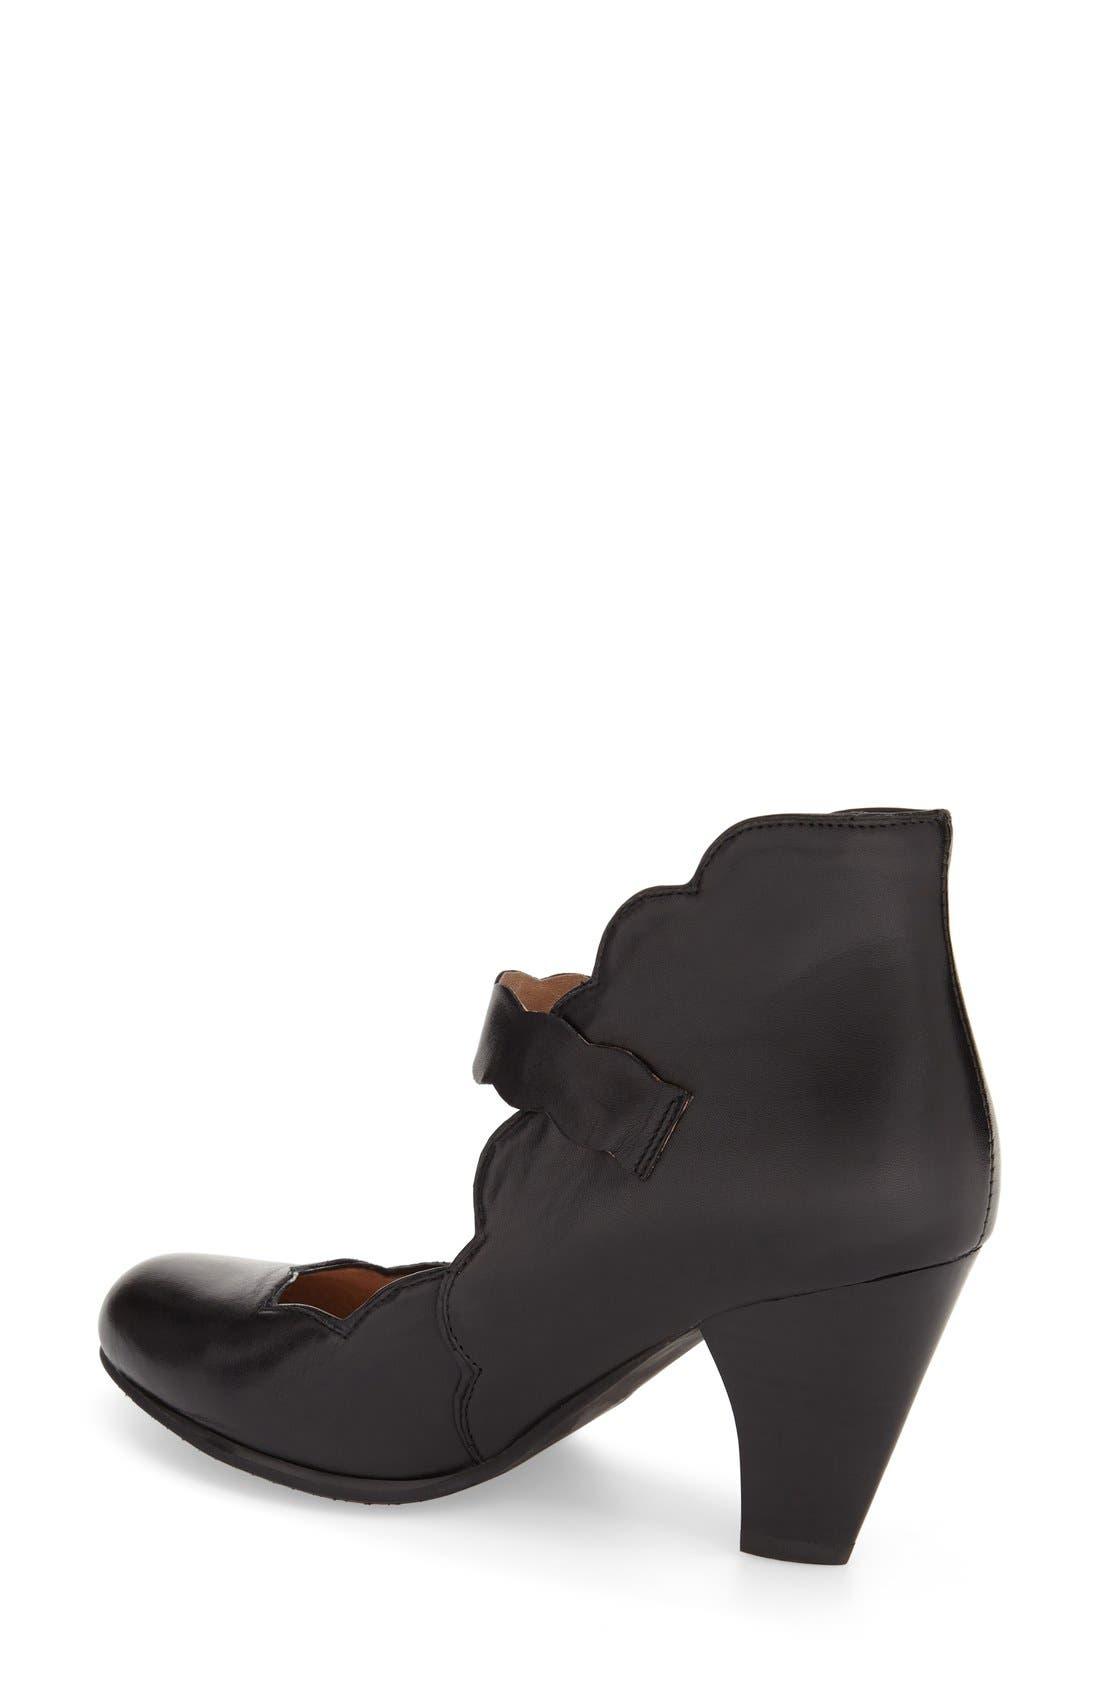 Alternate Image 2  - Miz Mooz Footwear 'Carissa' Mary Jane Pump (Women)